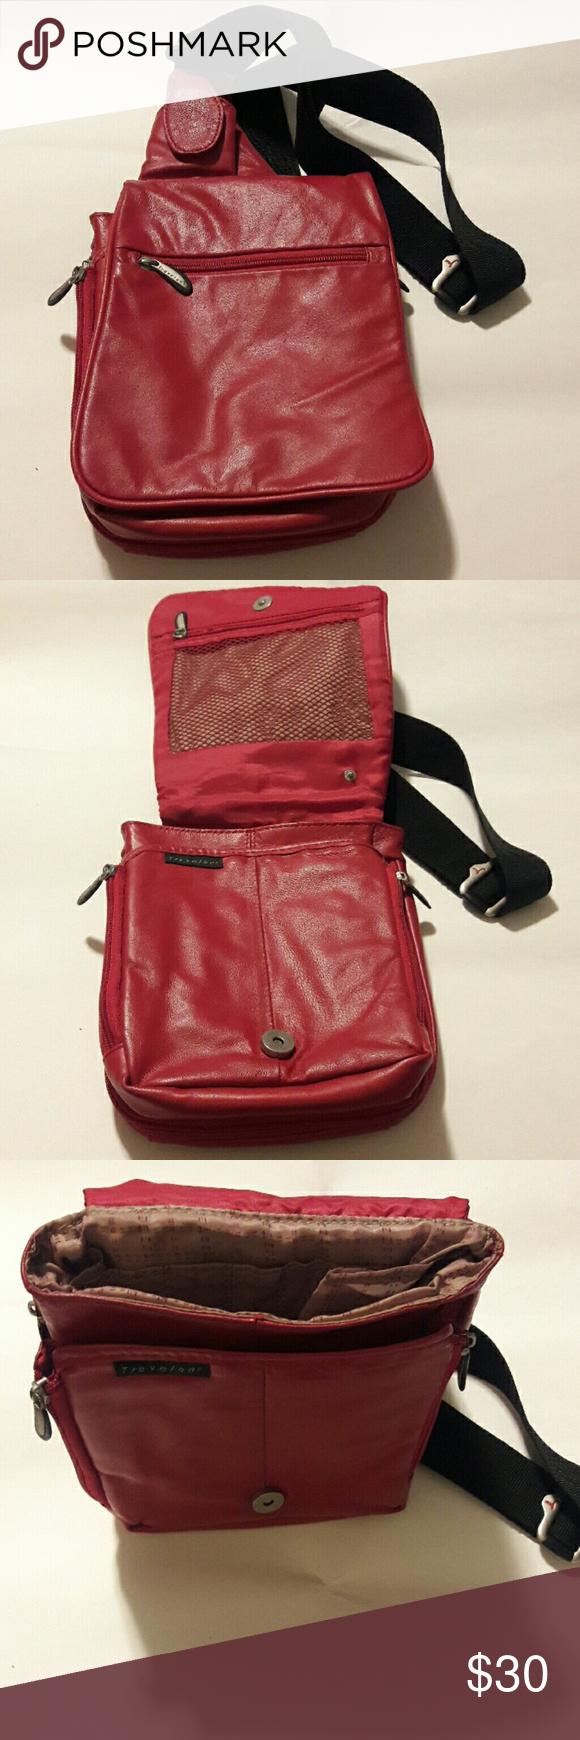 Travelon red expandable leather crossbody bag Excellent preowned condition travelon  Bags Crossbody Bags e042cbb7da